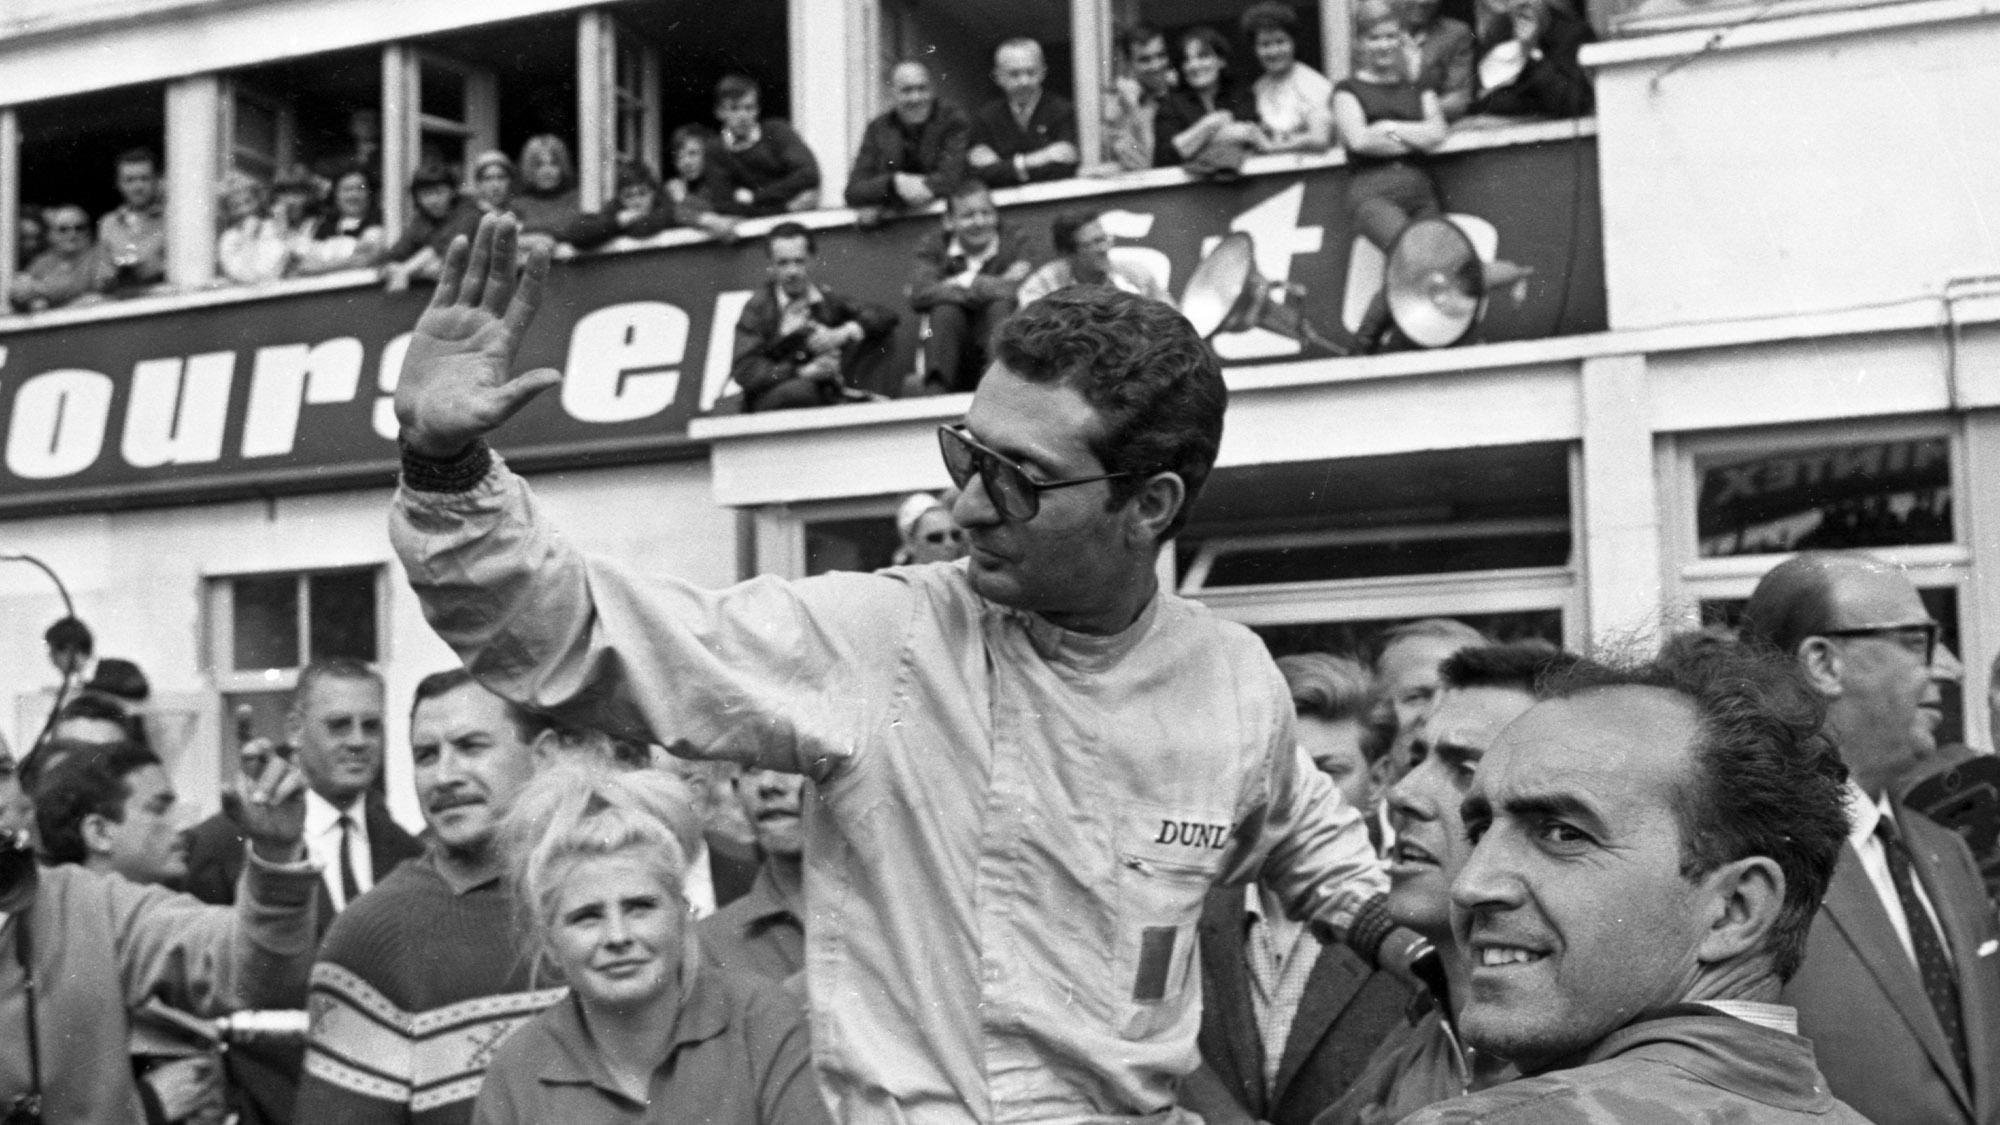 Nino Vaccarella celebrates Le Mans victory in 1964